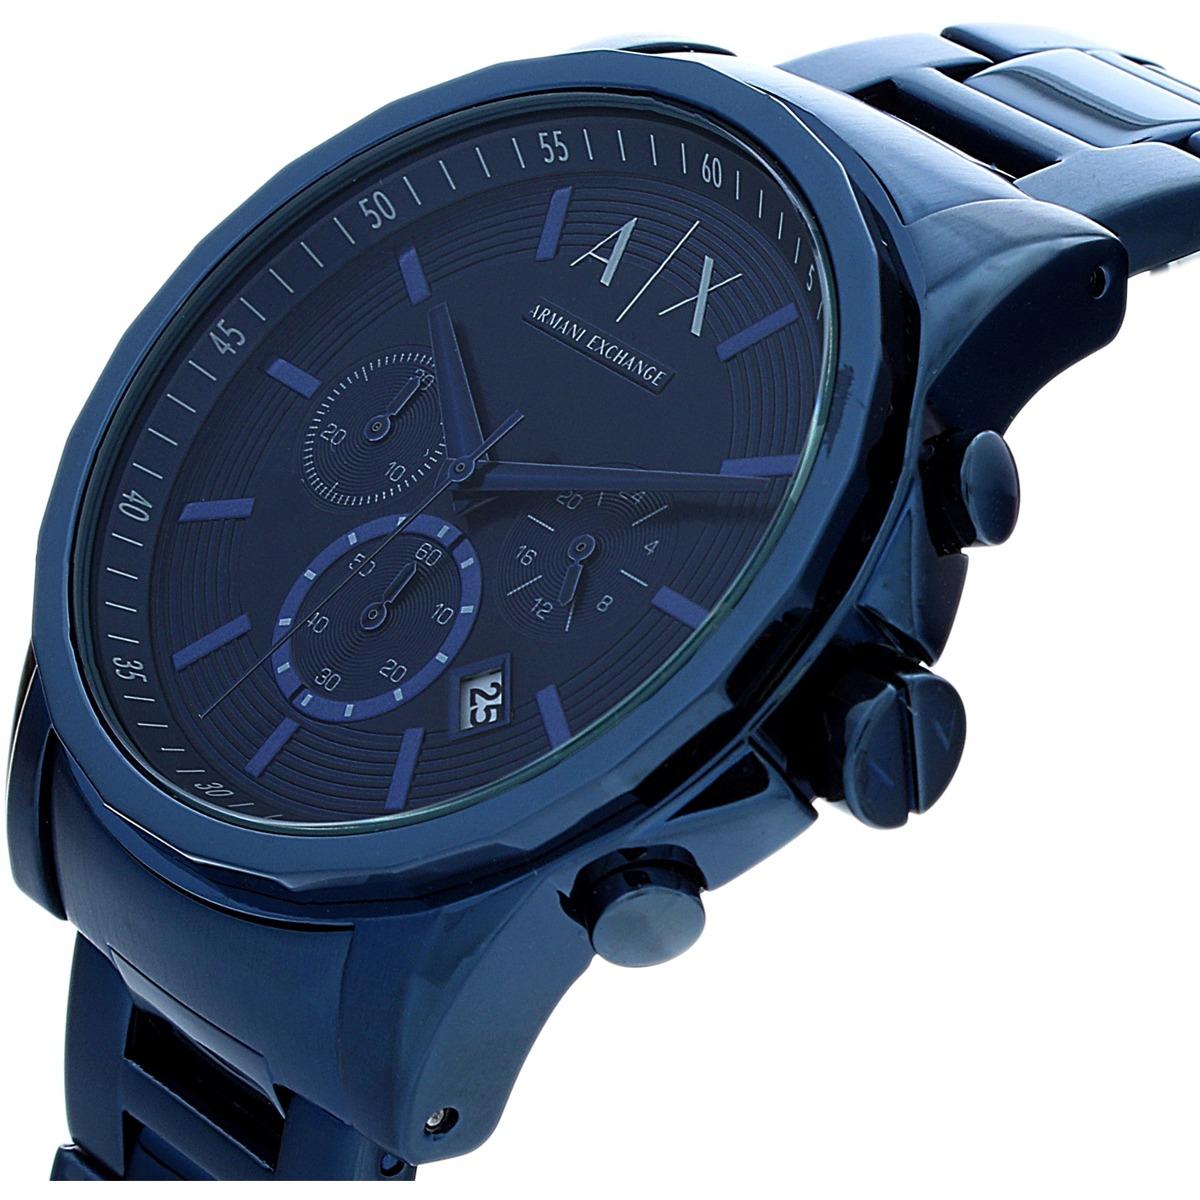 701a51995 Reloj Armani Exchange Para Hombre Ax2512 Azul En Acero - $ 6,166.68 ...